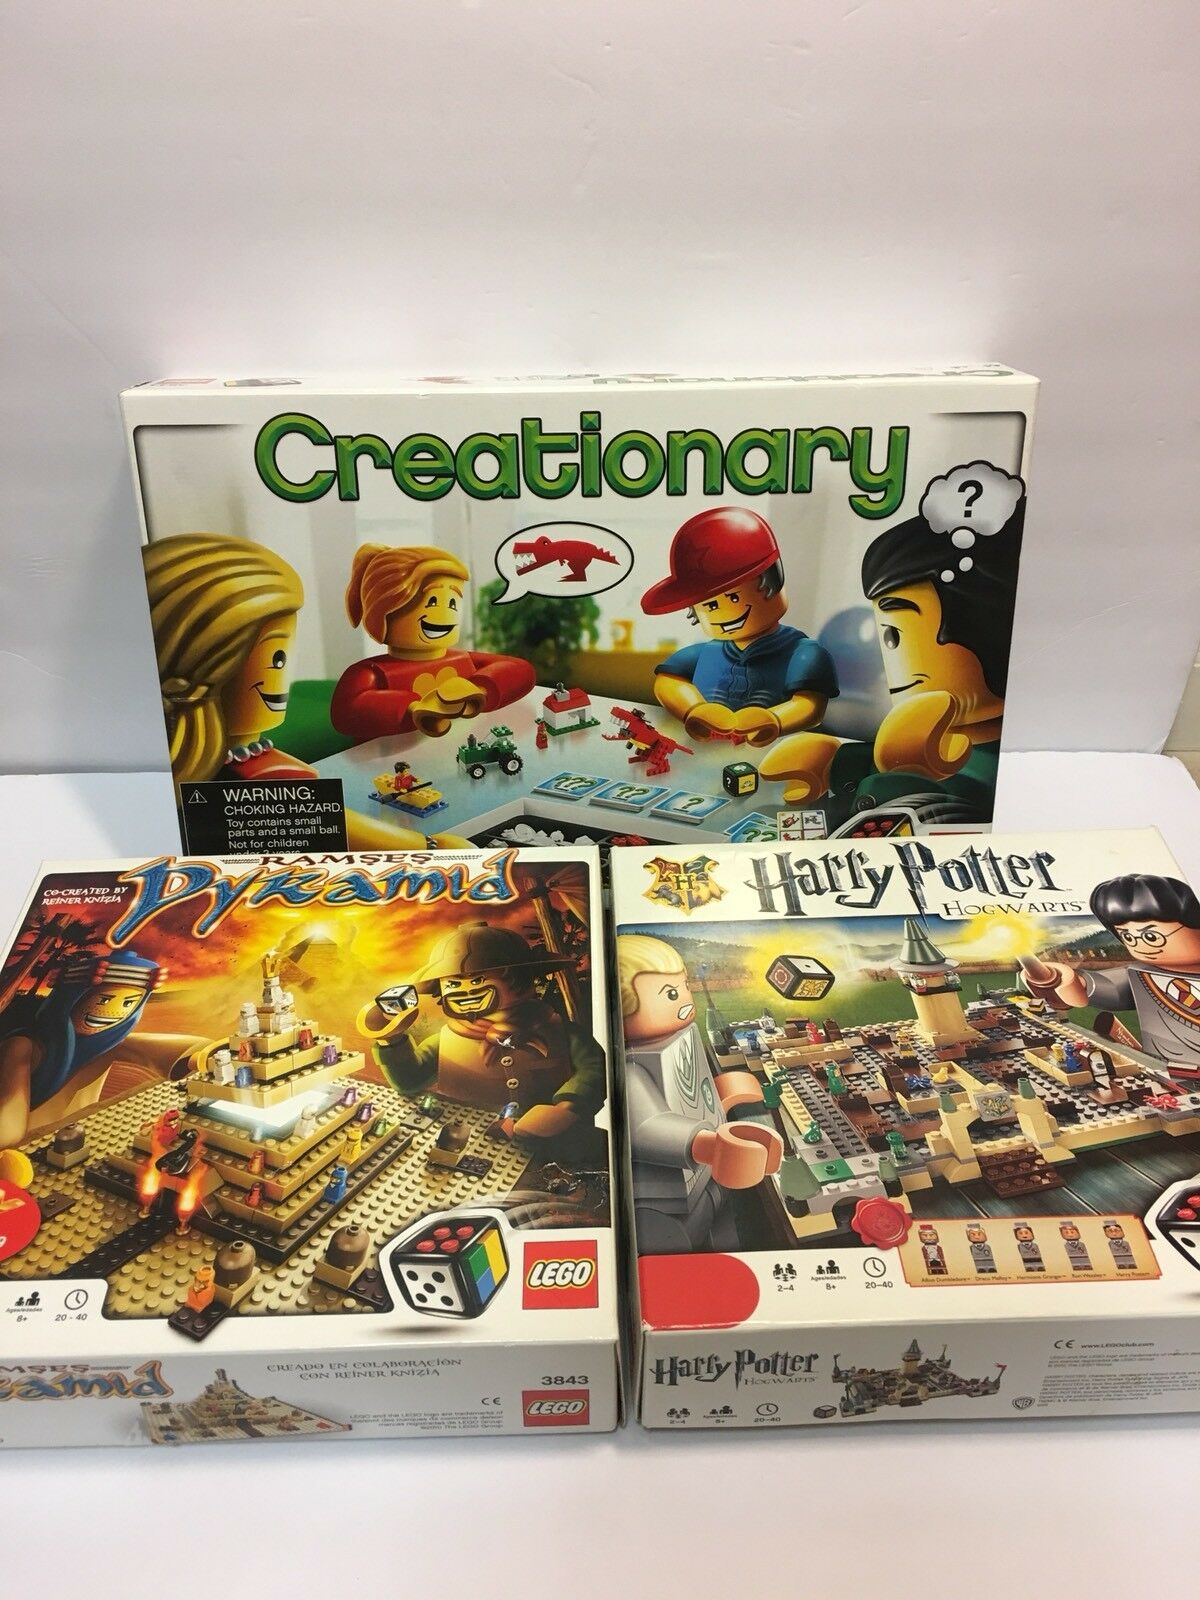 Lego Harry Potter Creationary y Ramses Pirámide 3843 3844 3862